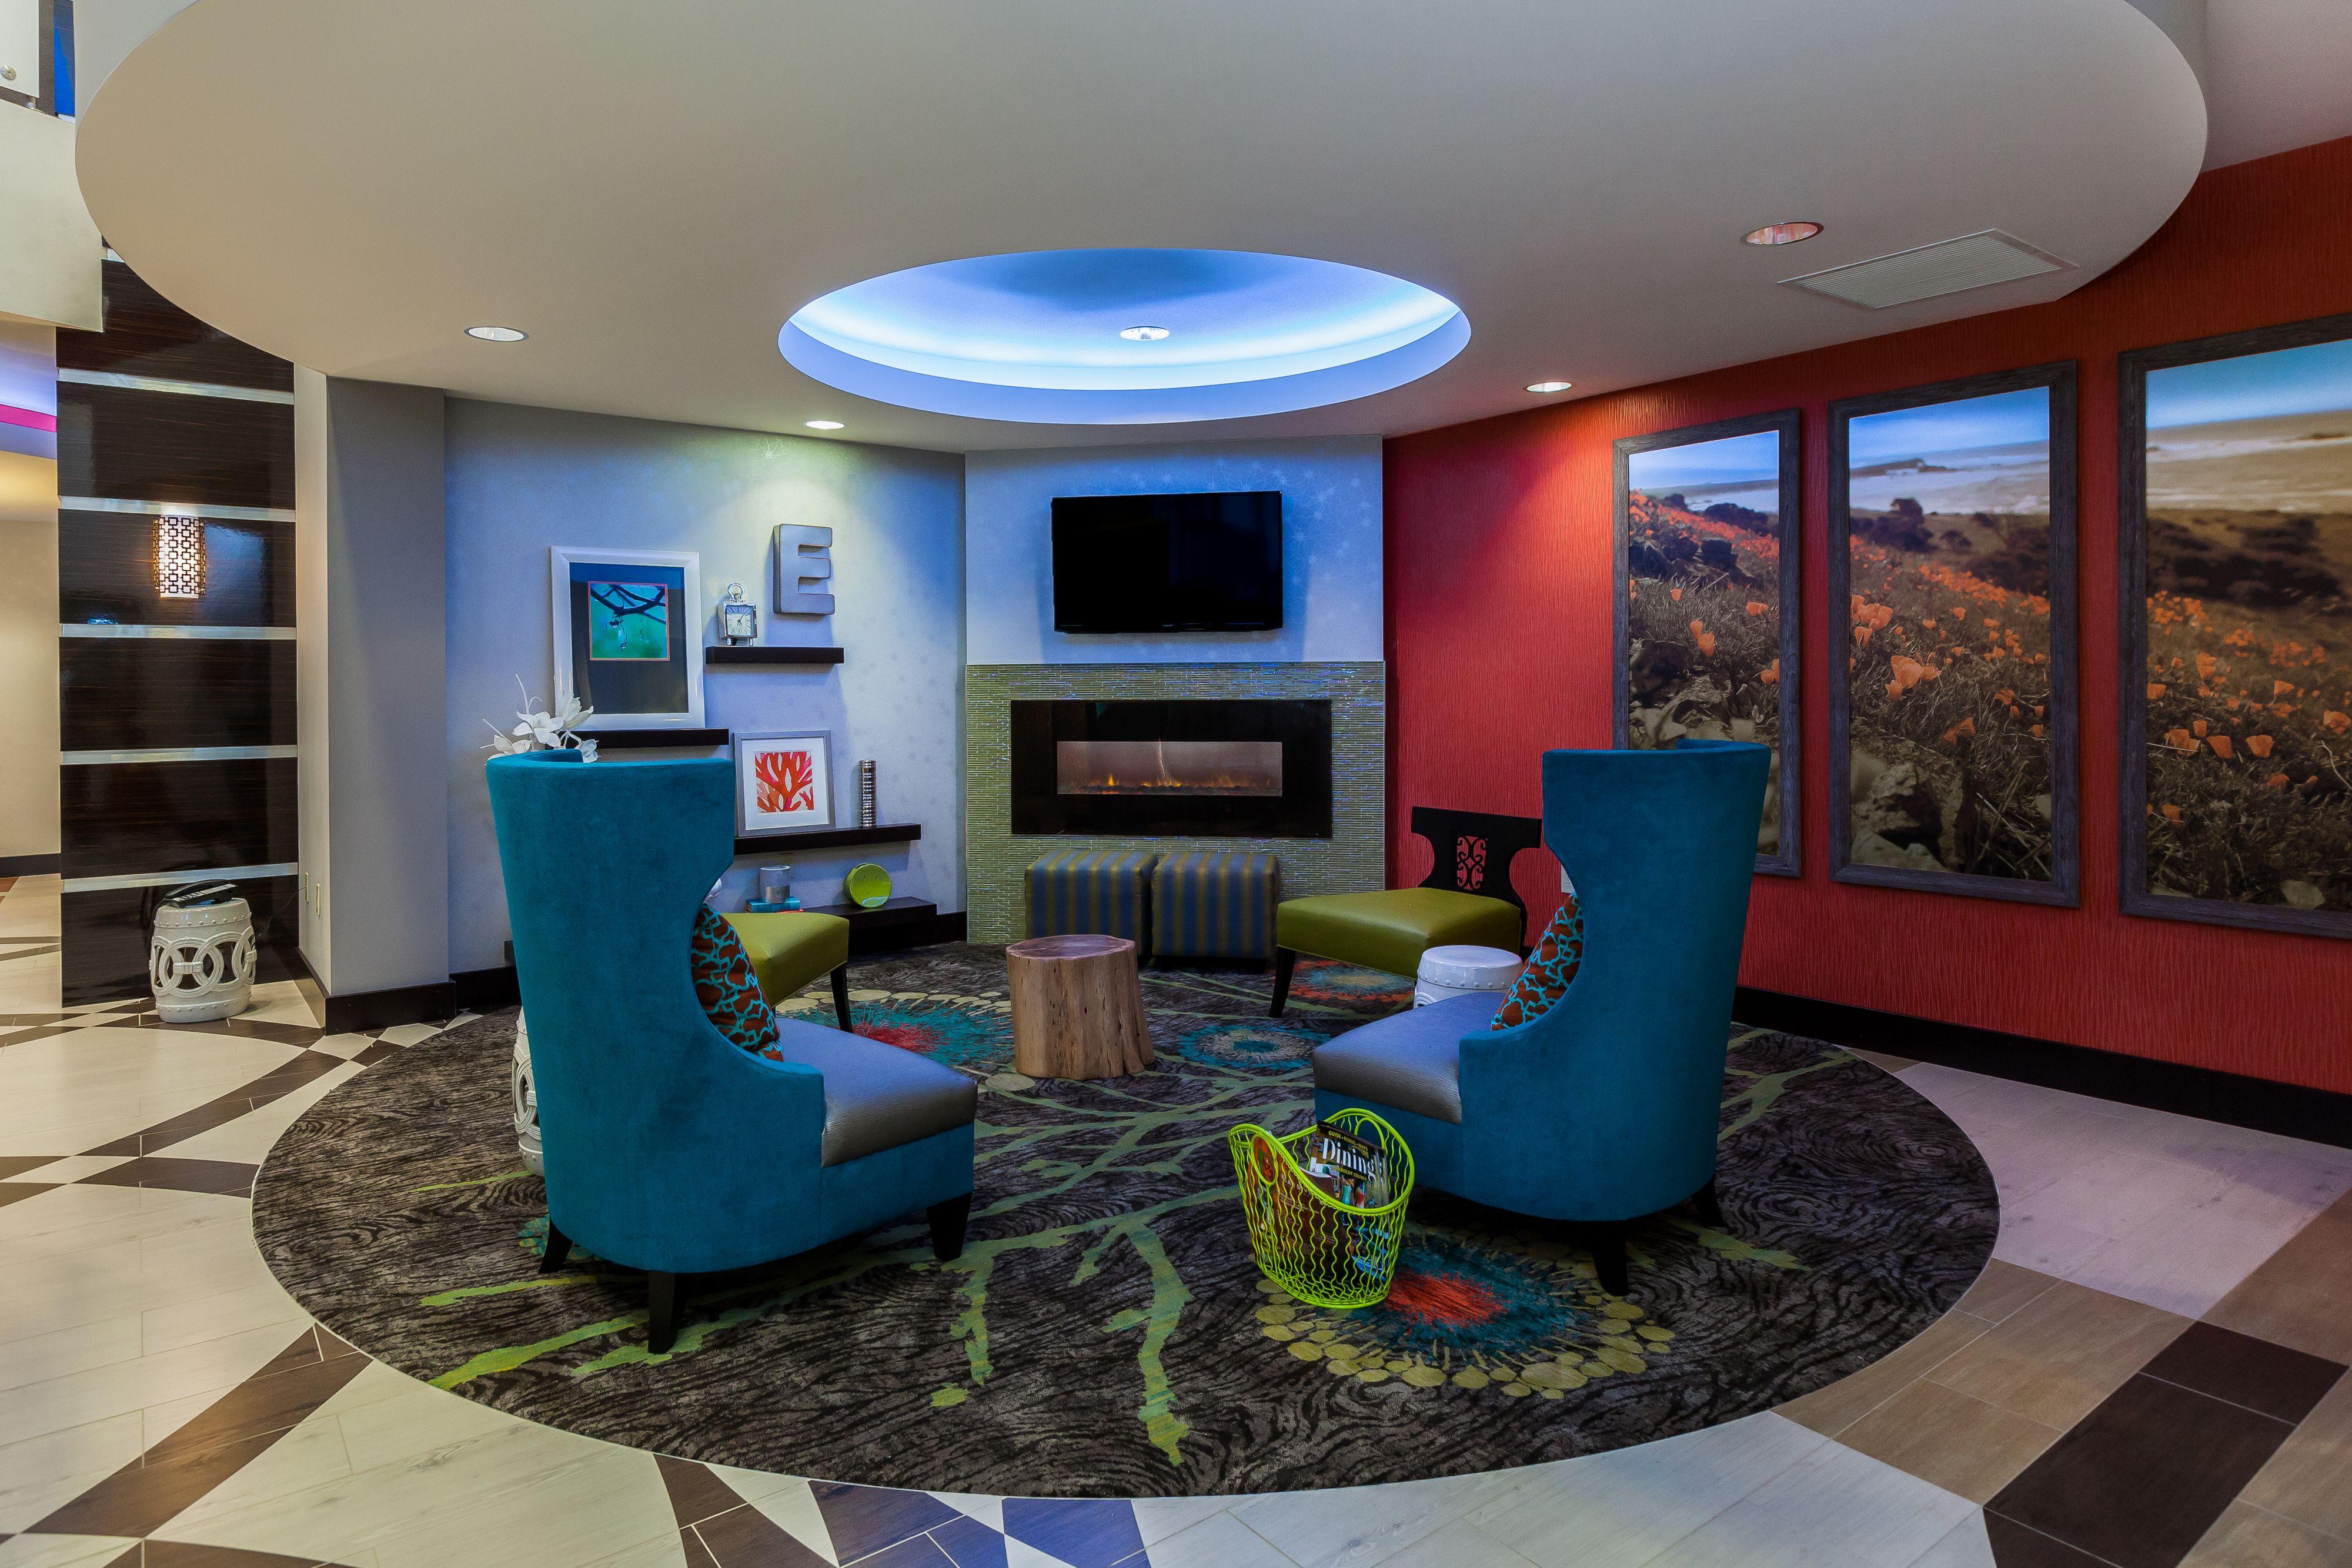 Holiday Inn Express & Suites Eureka image 7